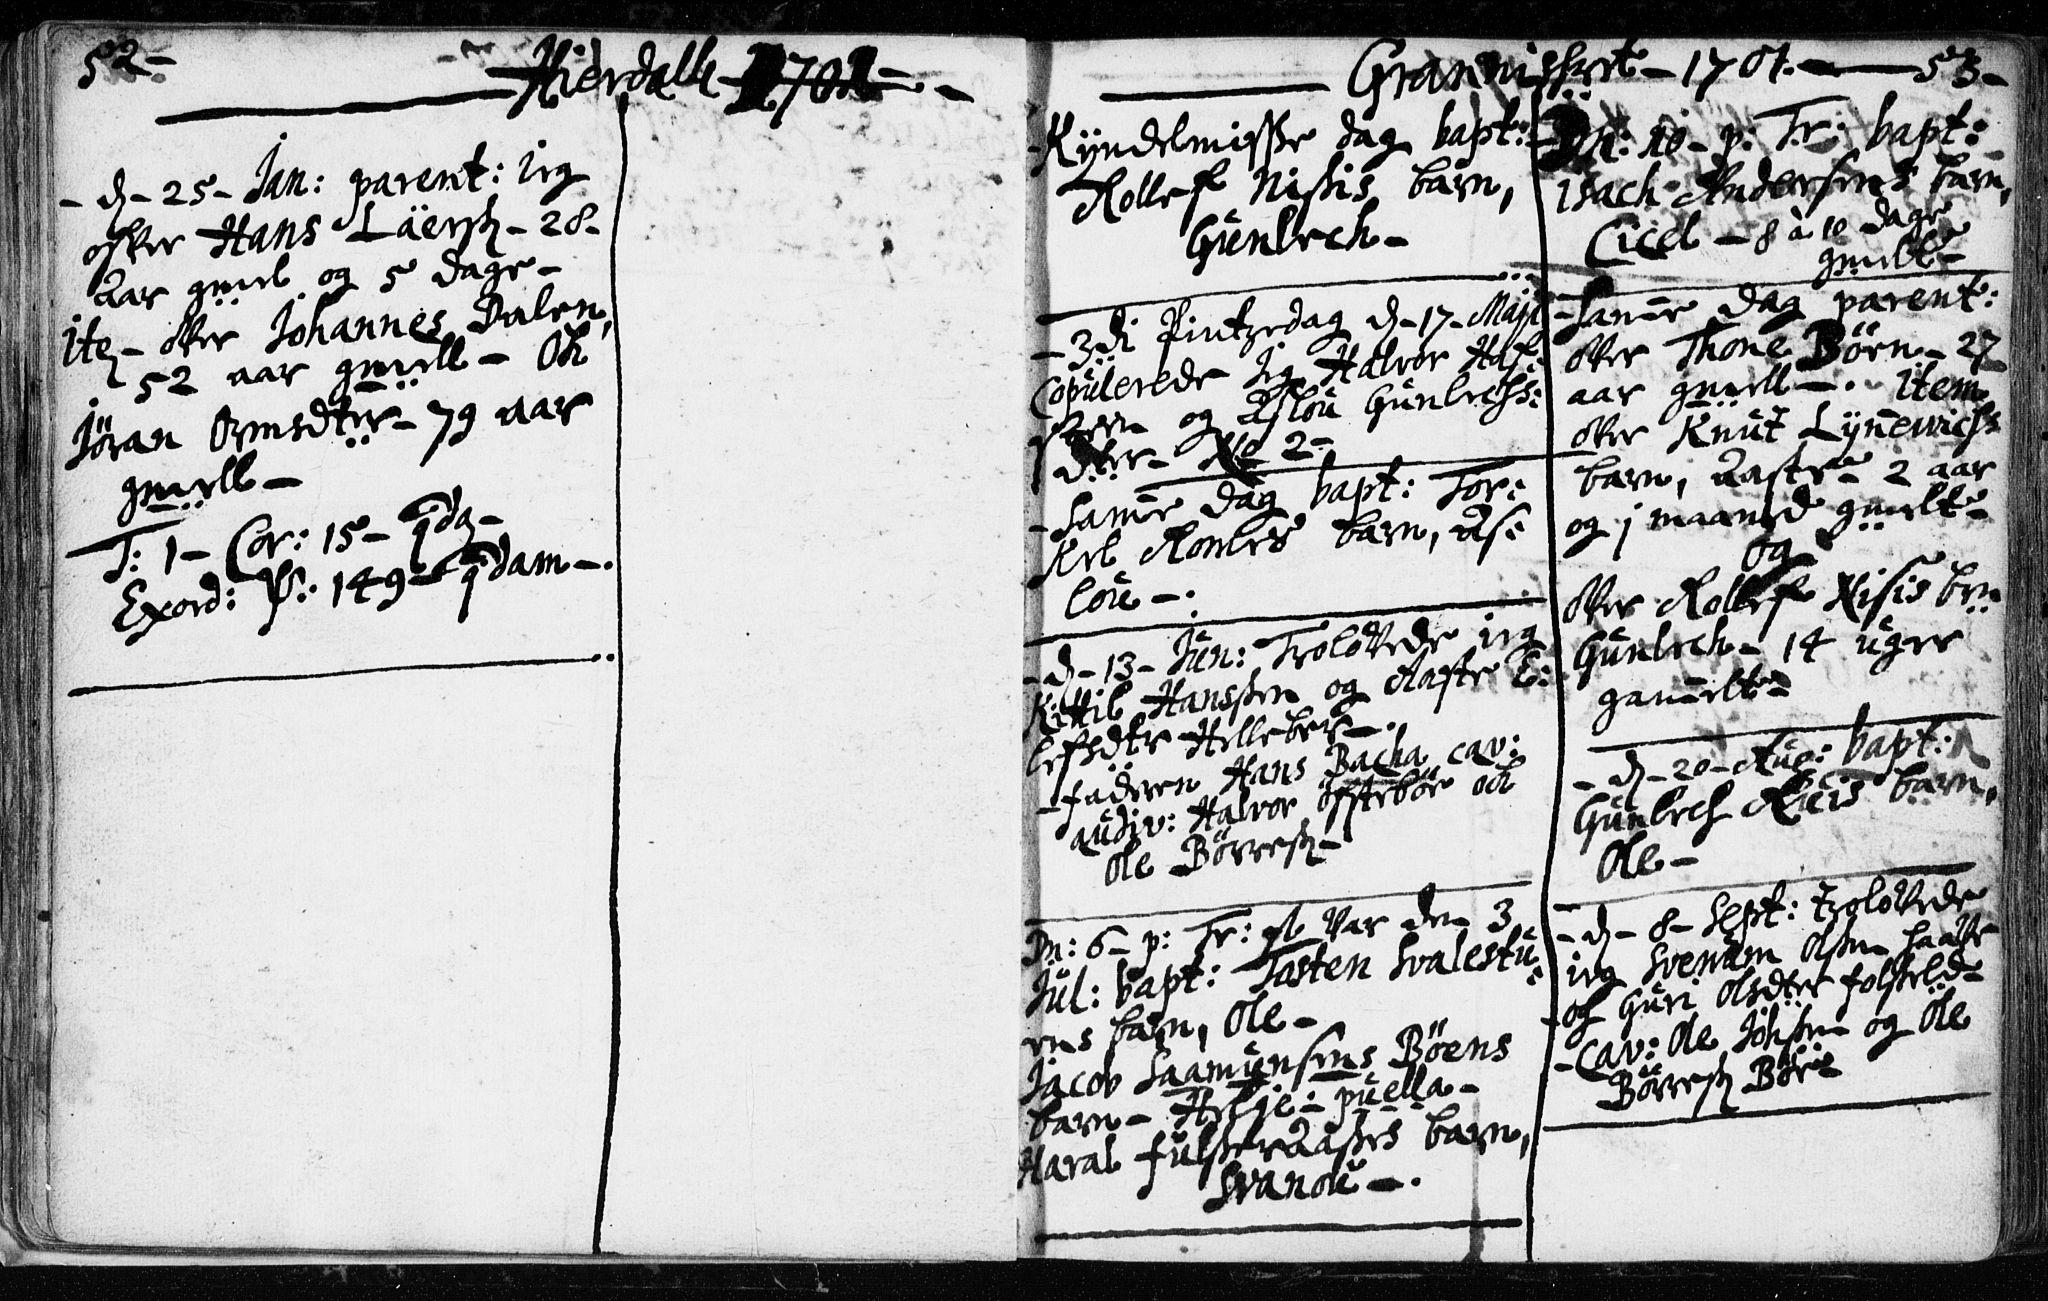 SAKO, Hjartdal kirkebøker, F/Fa/L0001: Ministerialbok nr. I 1, 1685-1714, s. 52-53